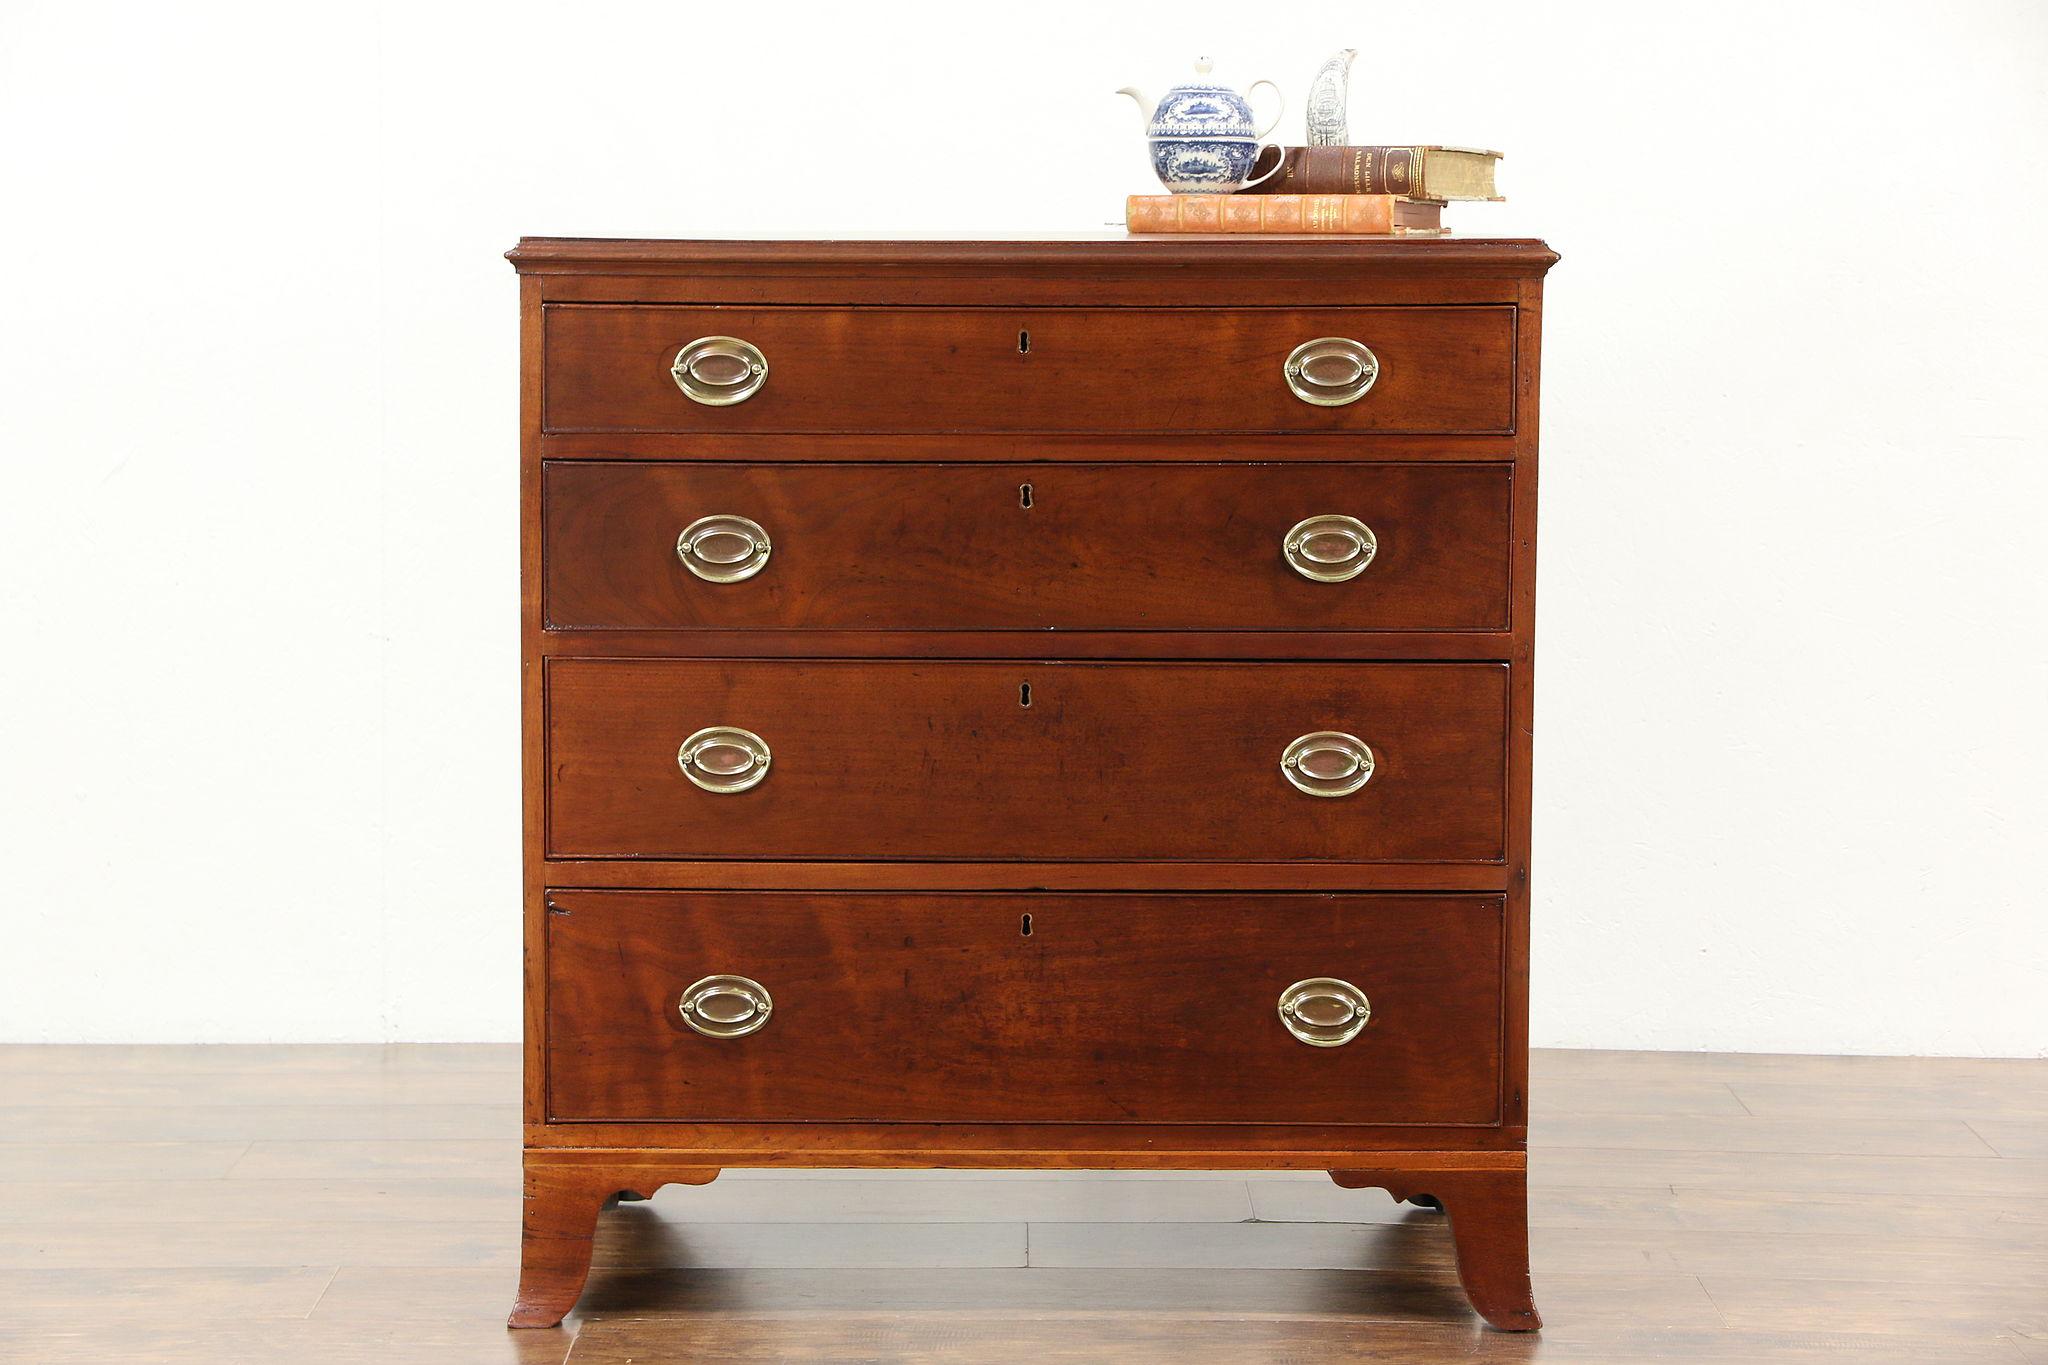 Superieur Walnut 1825 Federal Period Antique Linen Chest Or Dresser